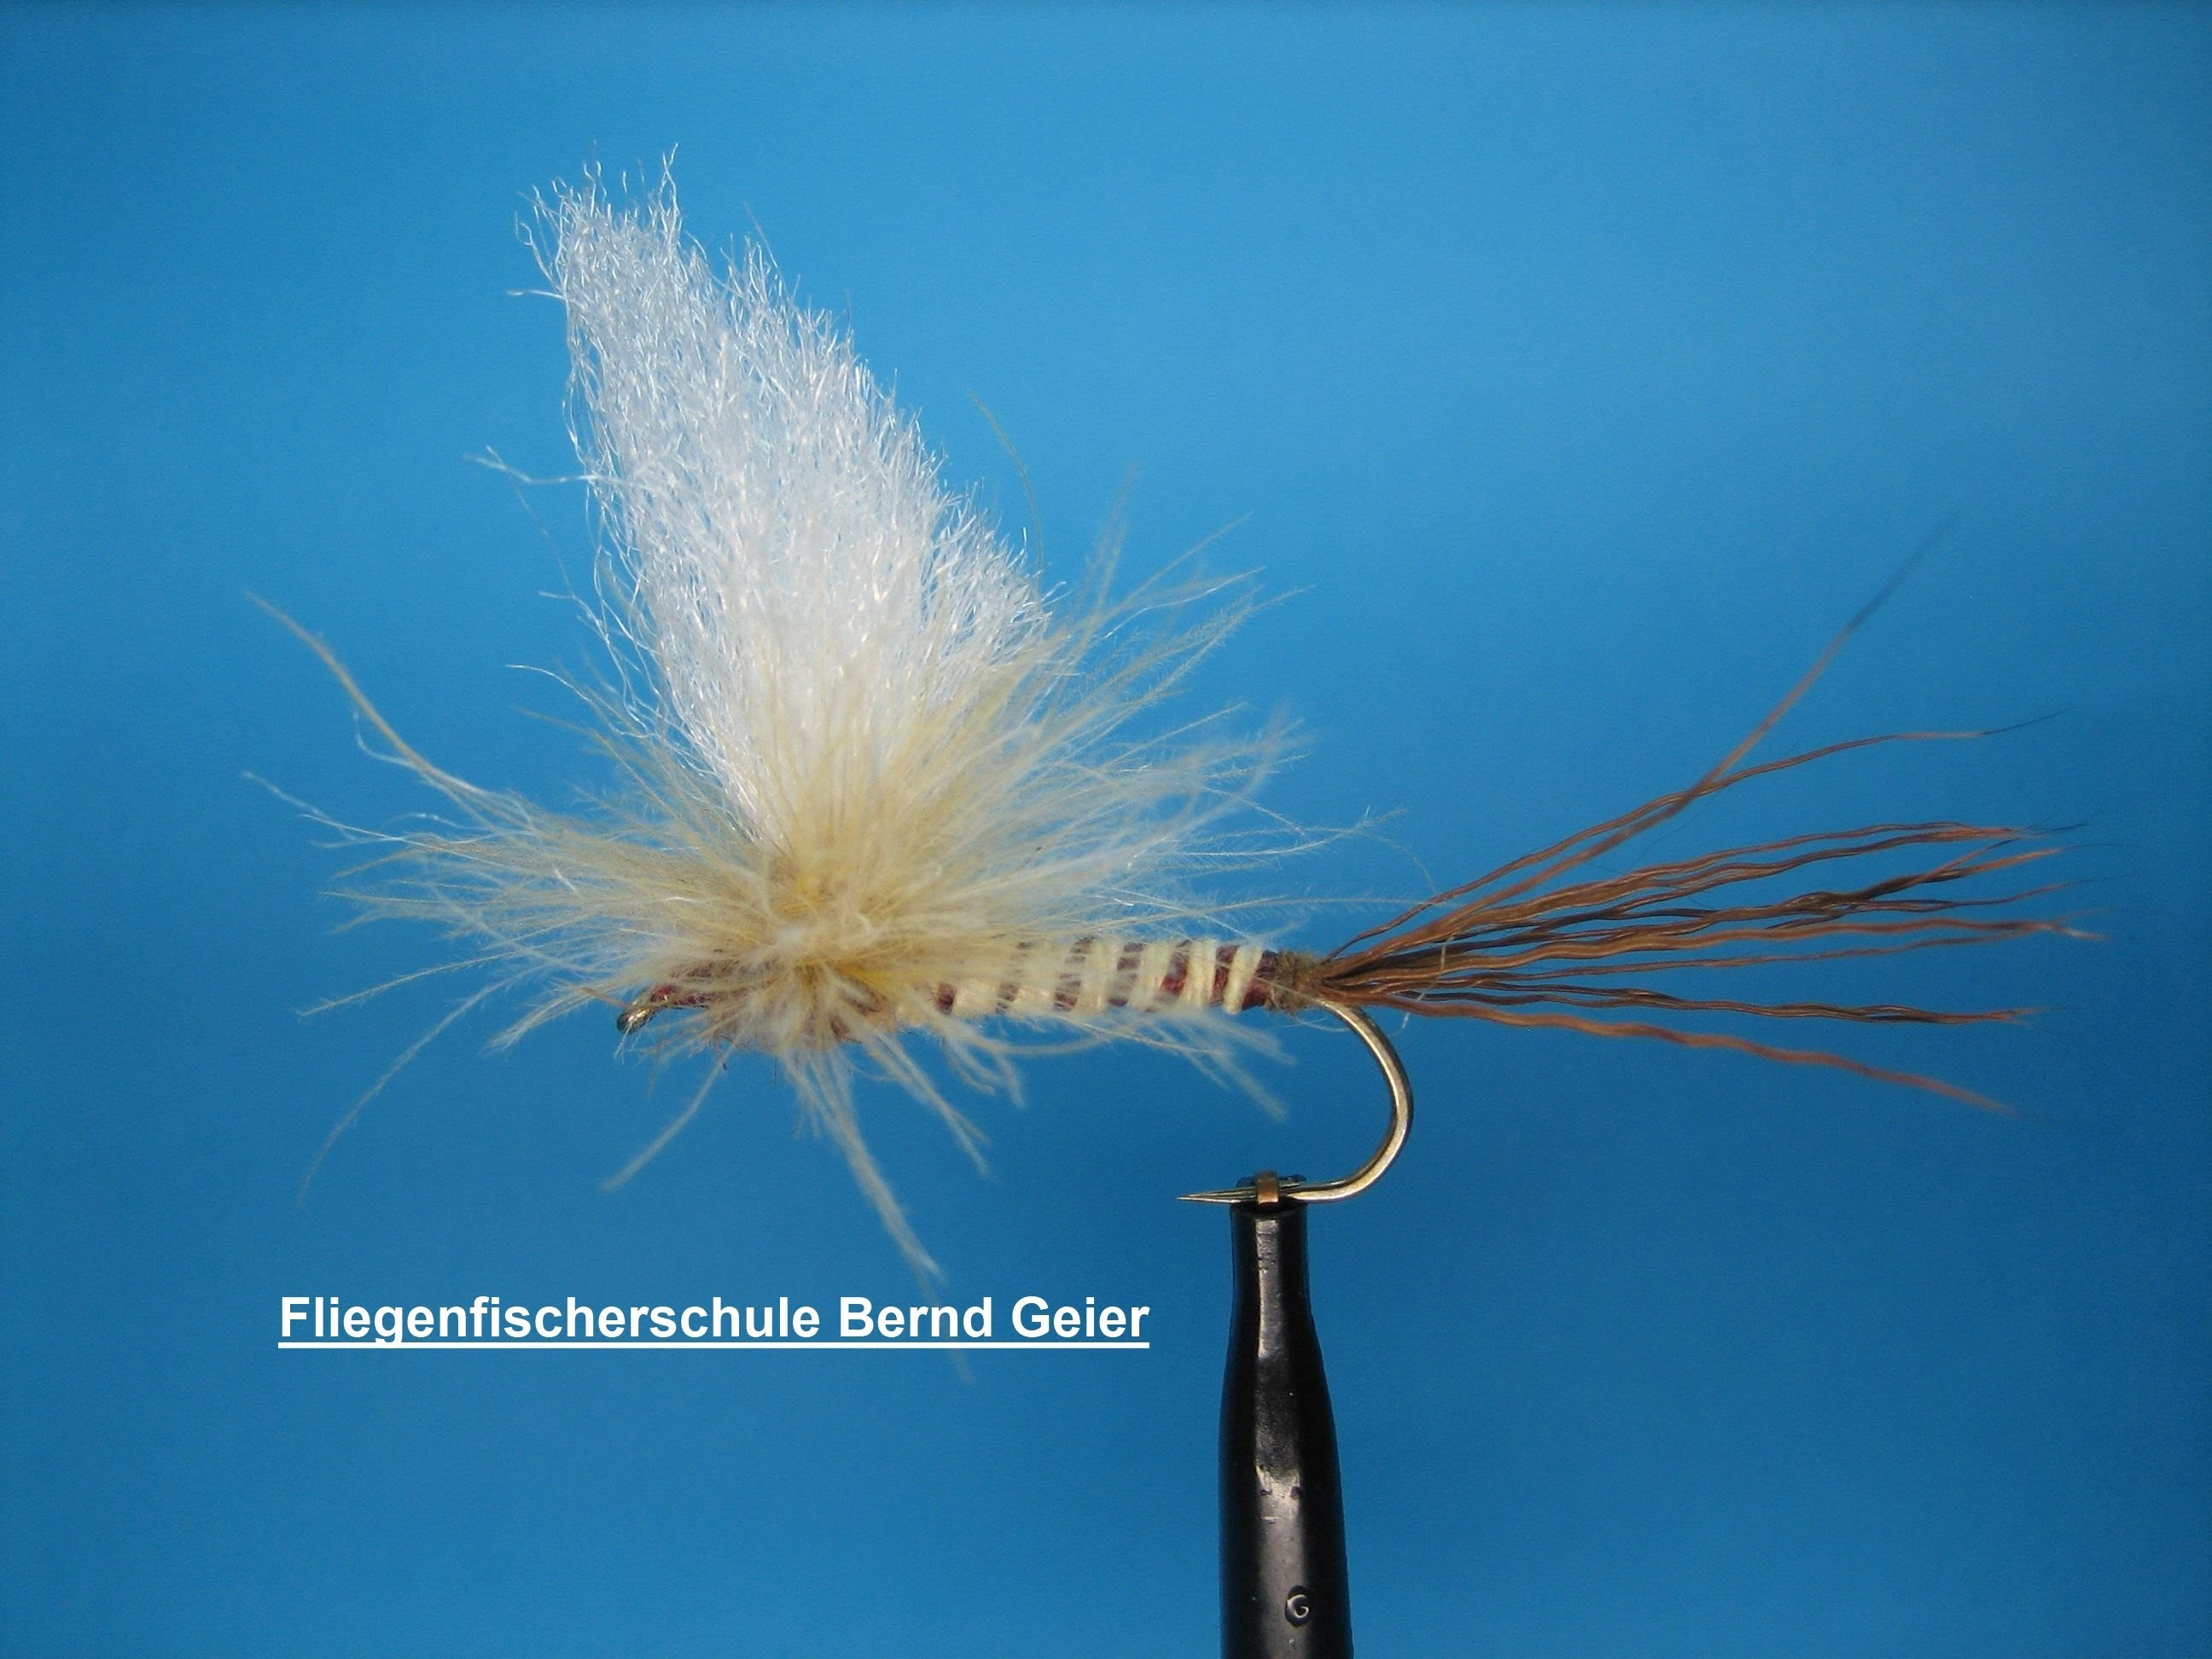 B.G. CDC- Rehhaar- Maifliege Danica, CDC- Deerhair- Mayfly Danica